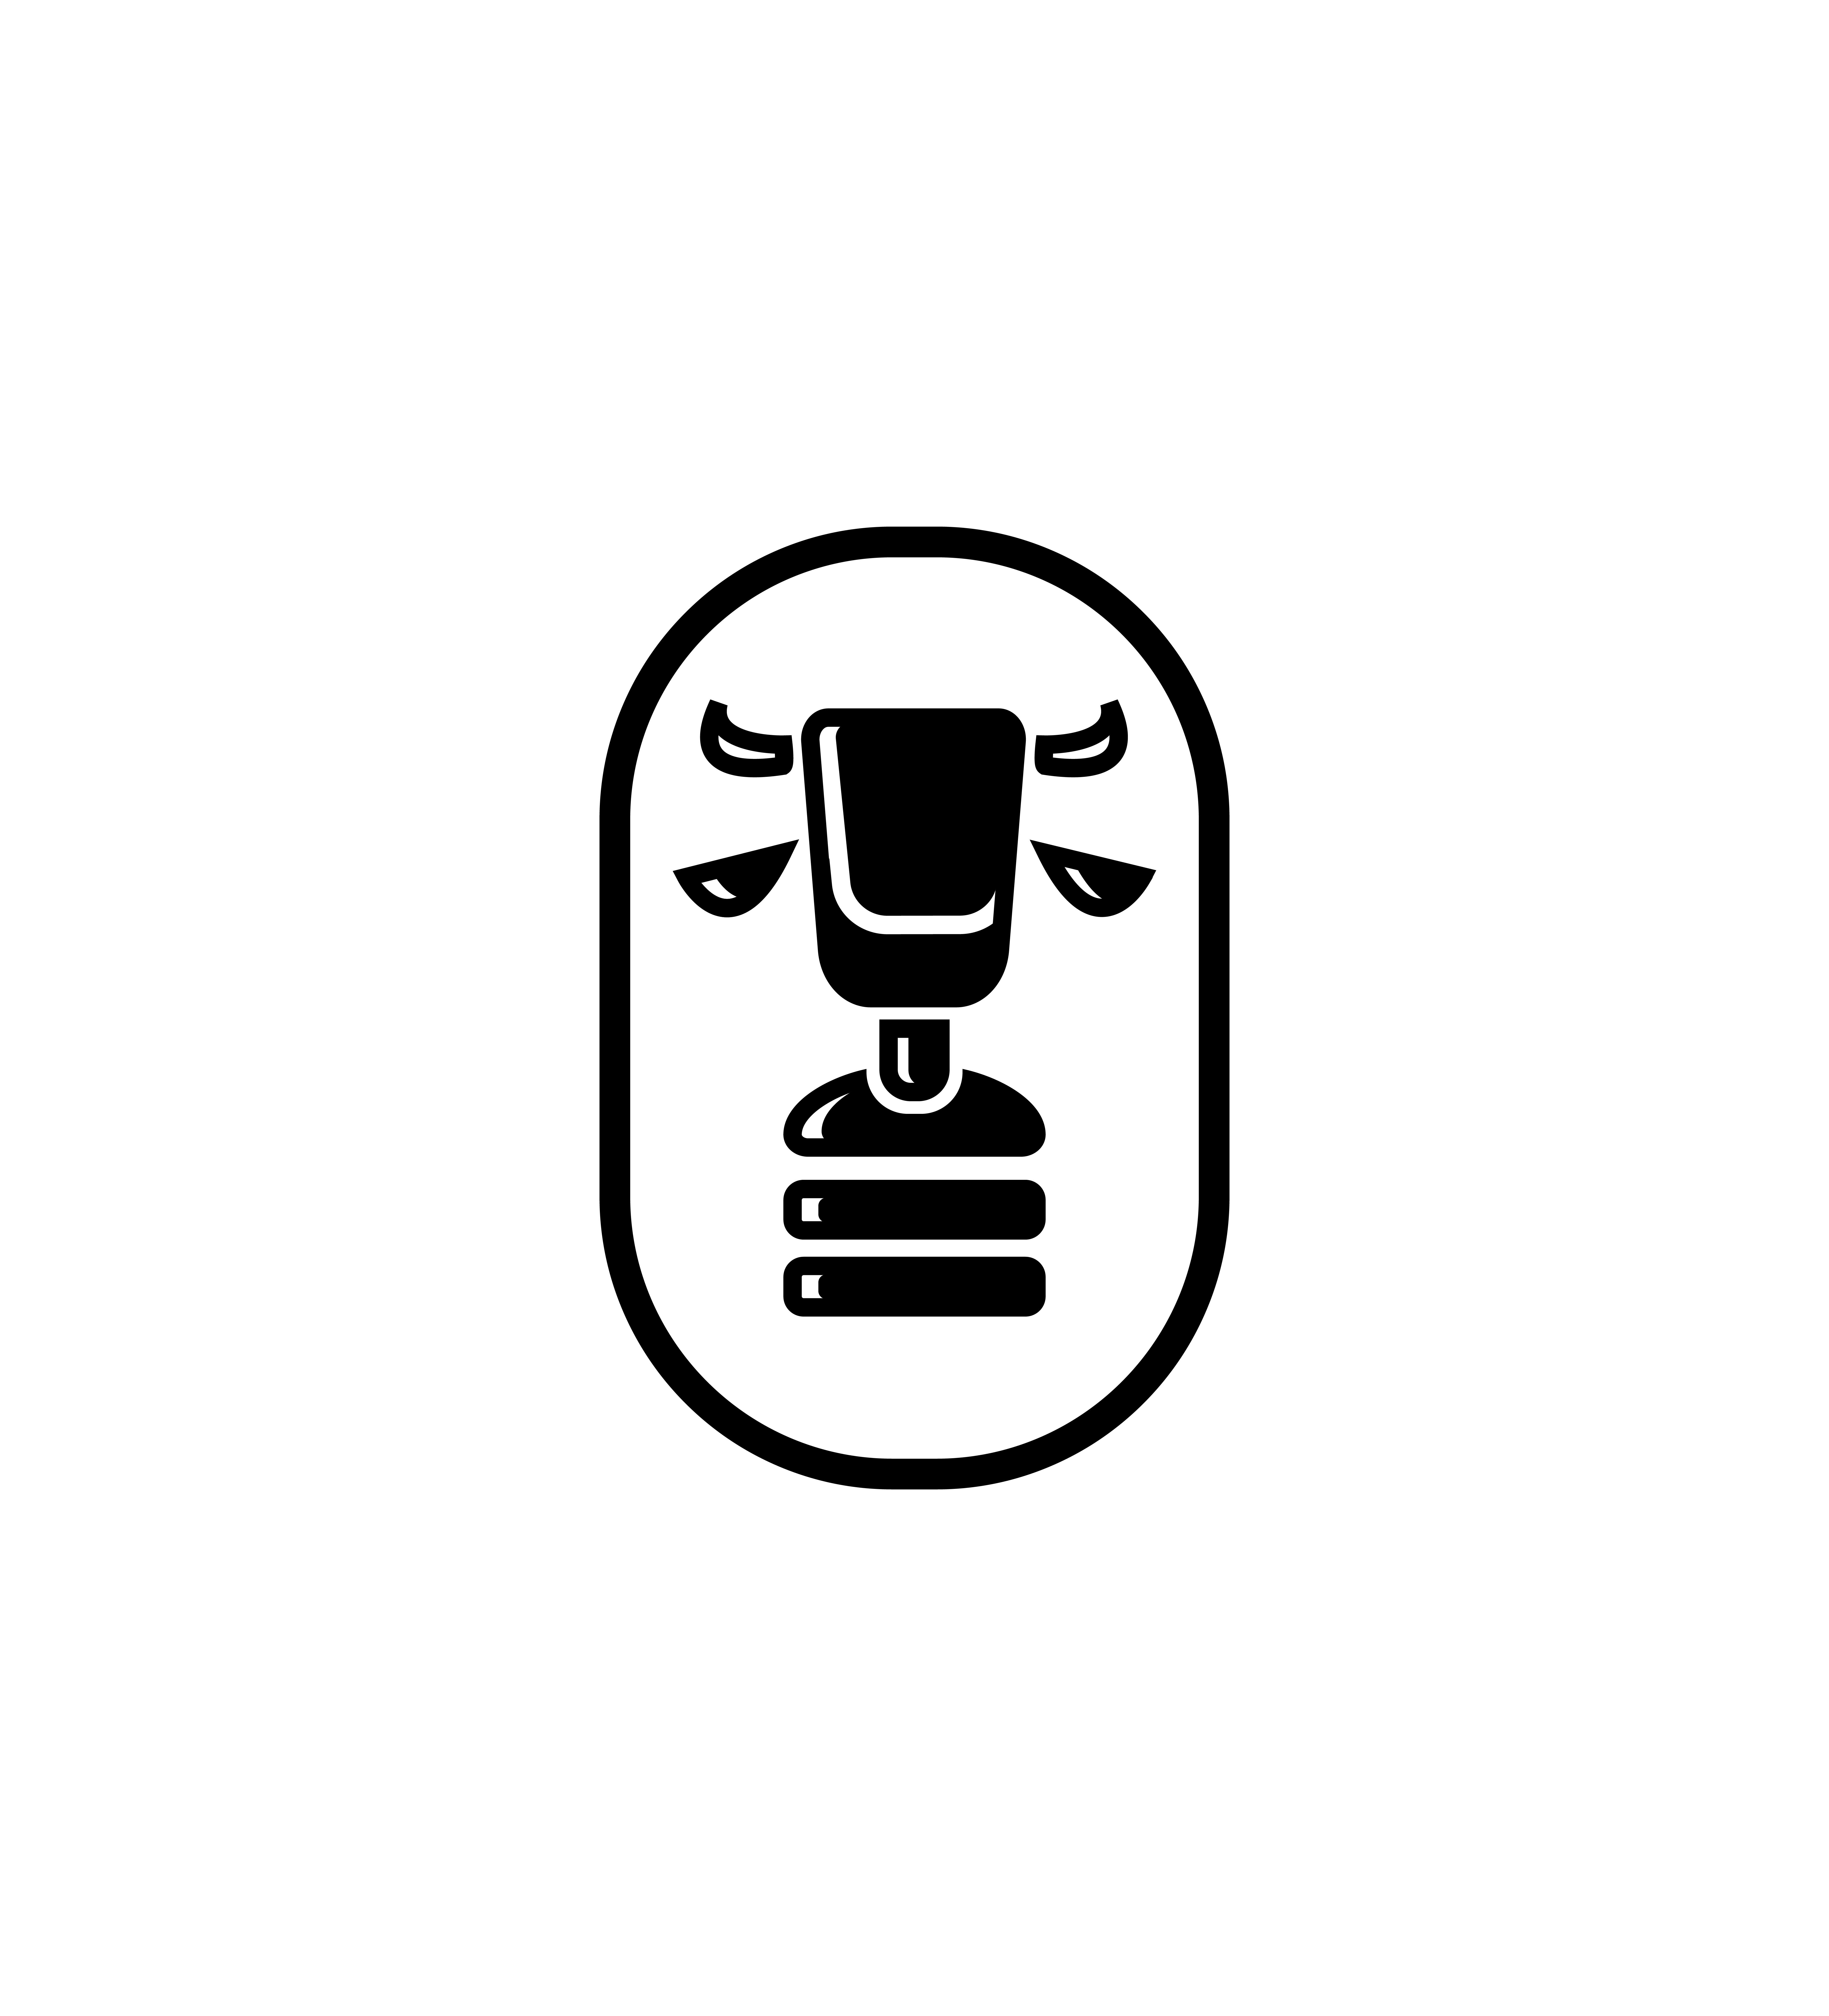 Логотип для Бургерной с Пекарней фото f_5255e1b1e4139fae.jpg